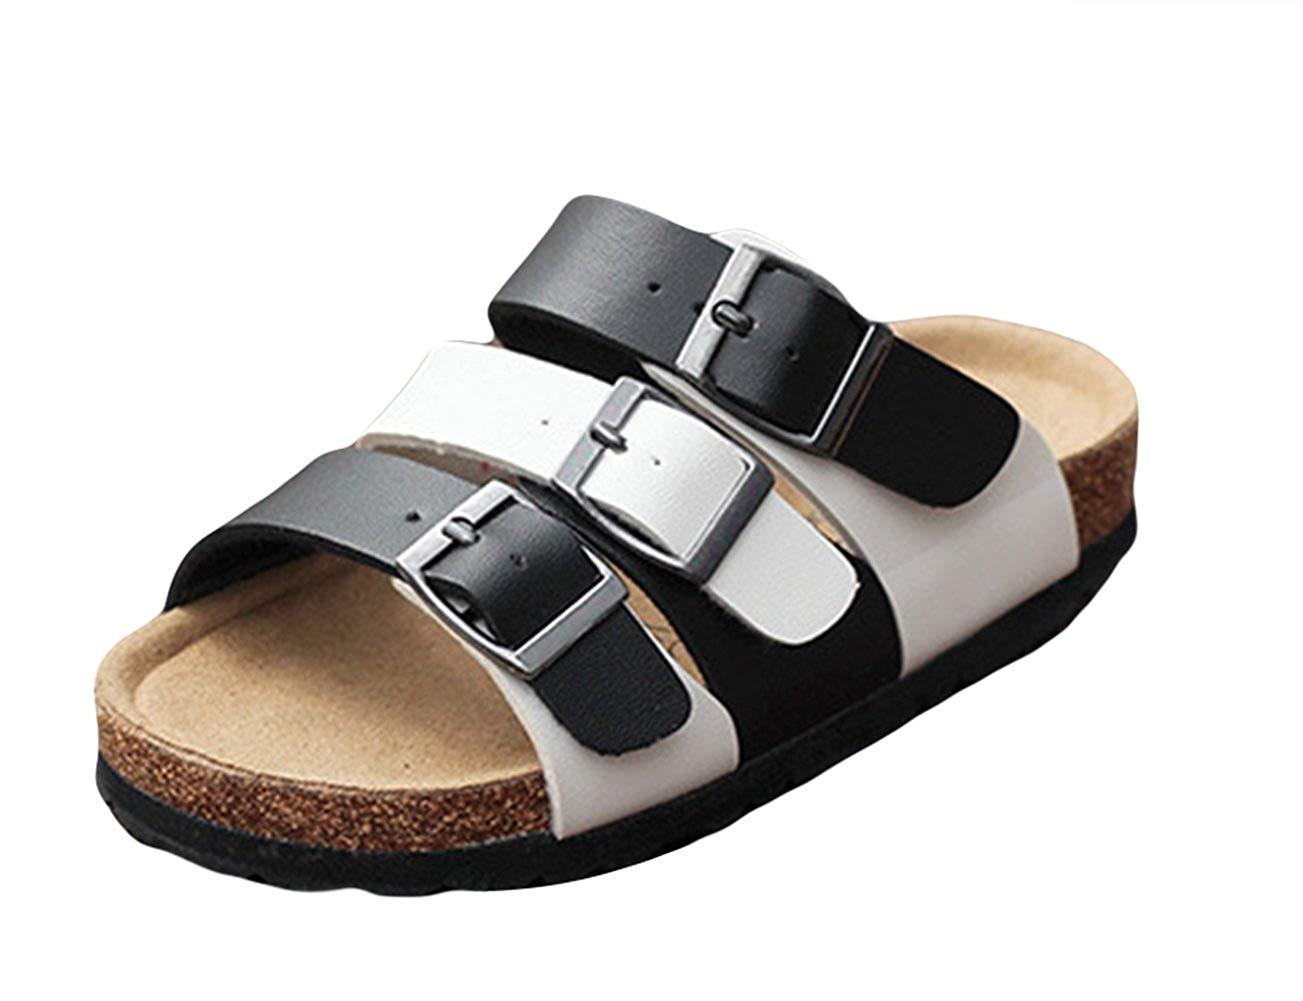 dadcbc28e7ec Liveinu Boys Girls Casual Sandal Fashion PU Leather Buckle Footbed Flat  Flip-Flops Cork Sandals